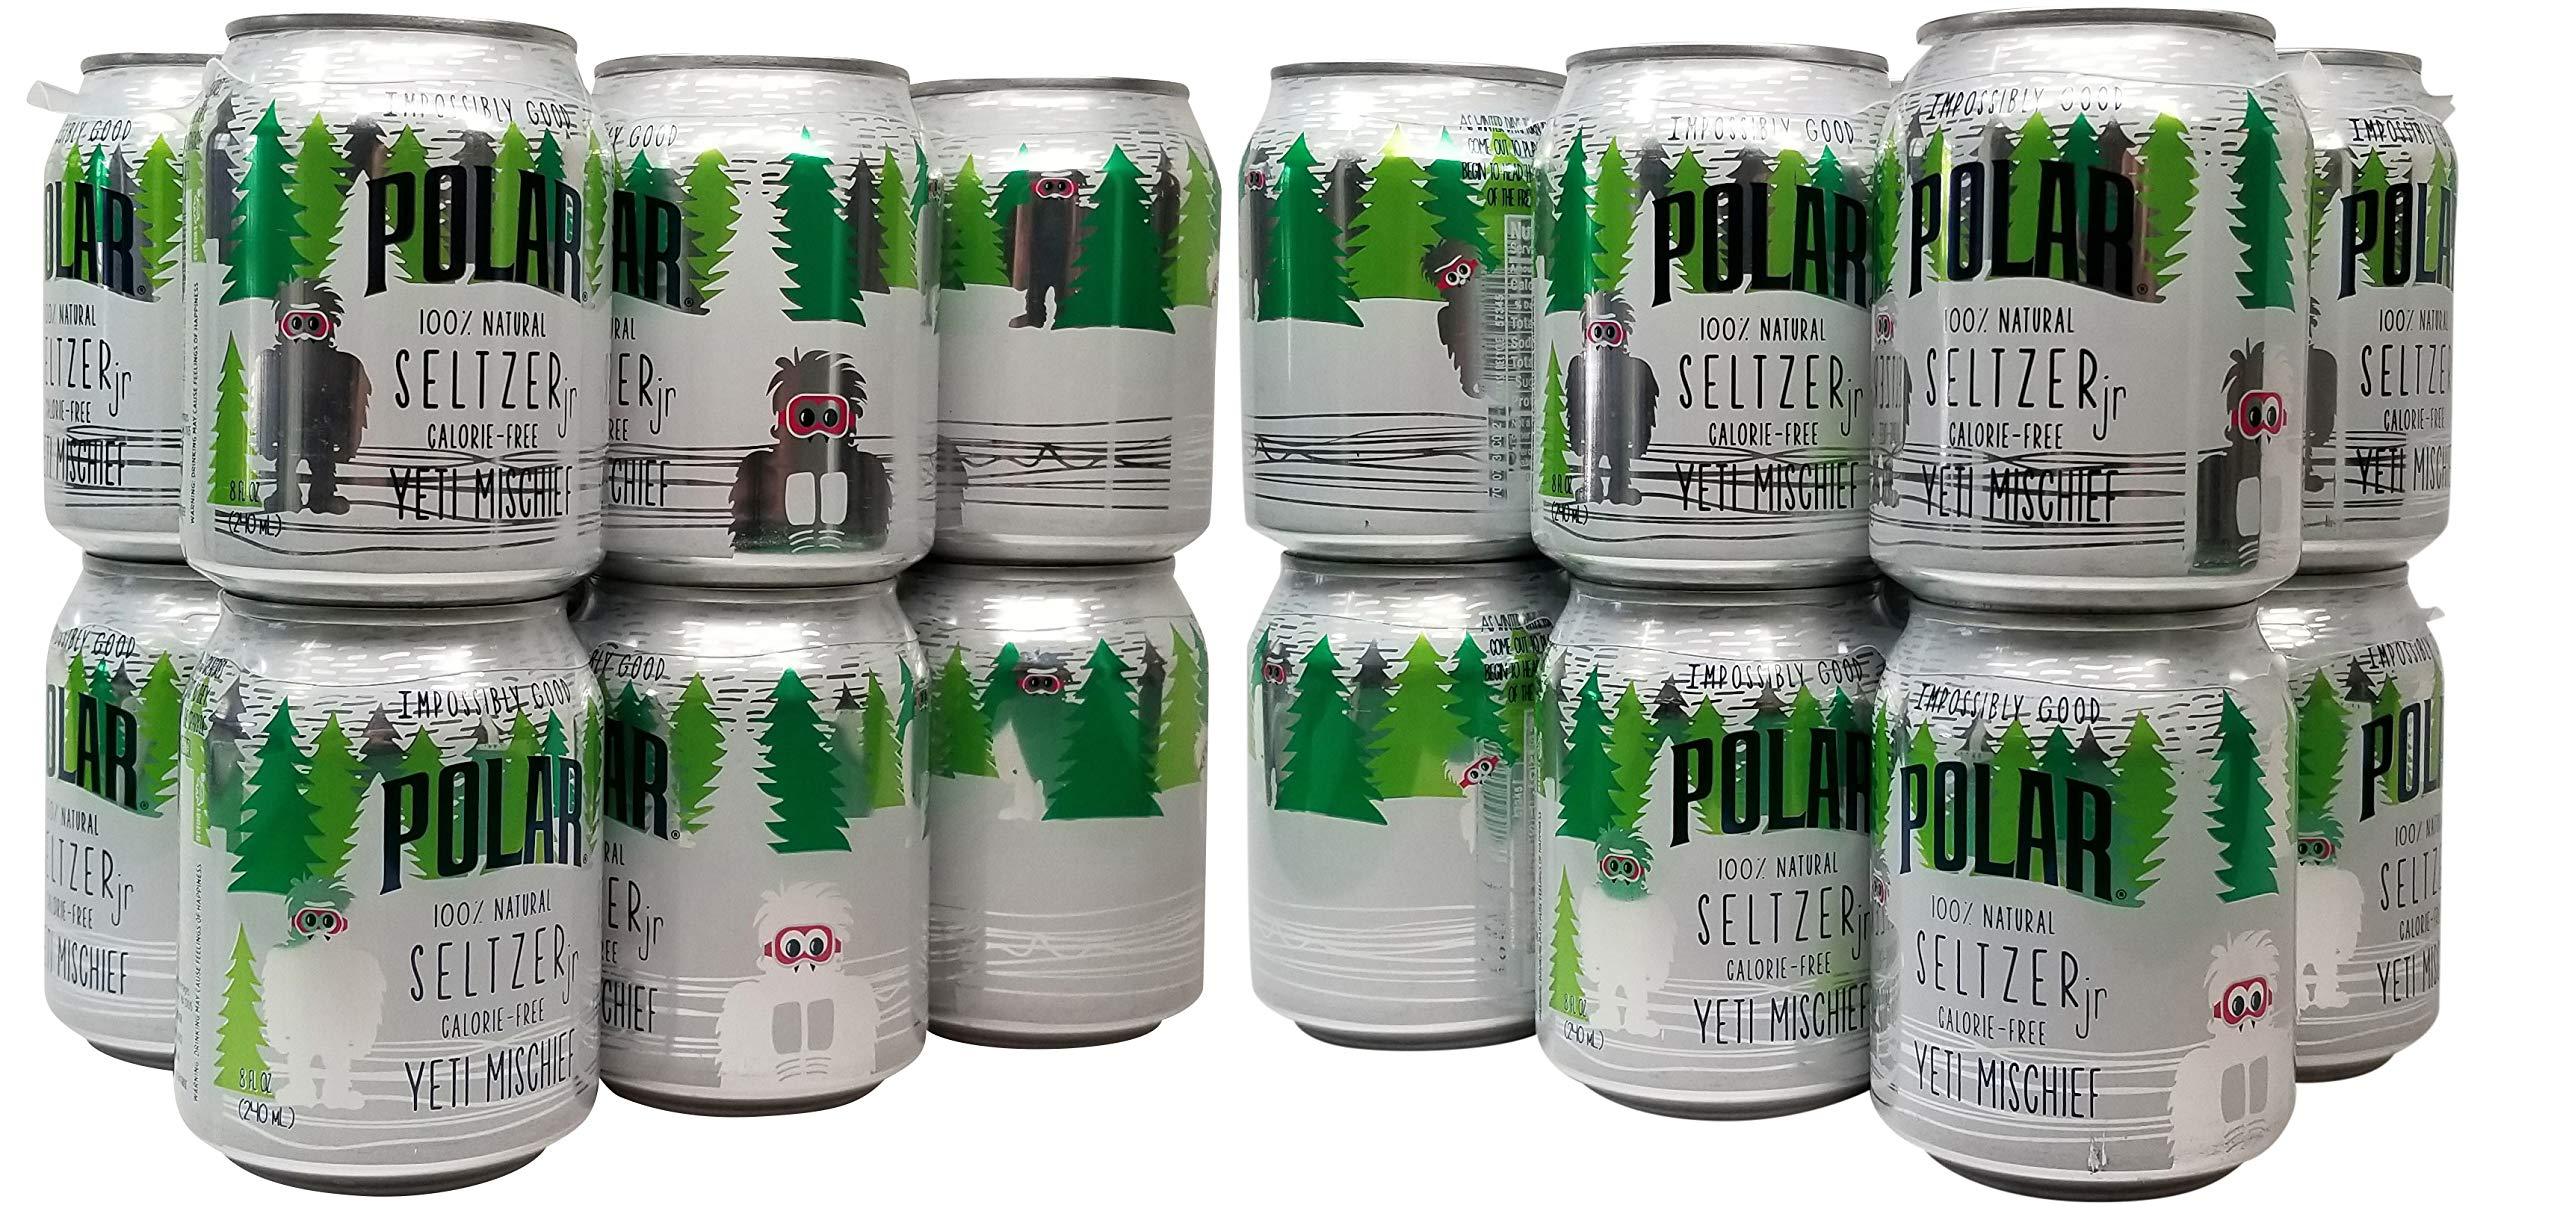 Polar Seltzer Impossibly Good Yeti Mischief 24 pk 8 oz. Cans by Generic